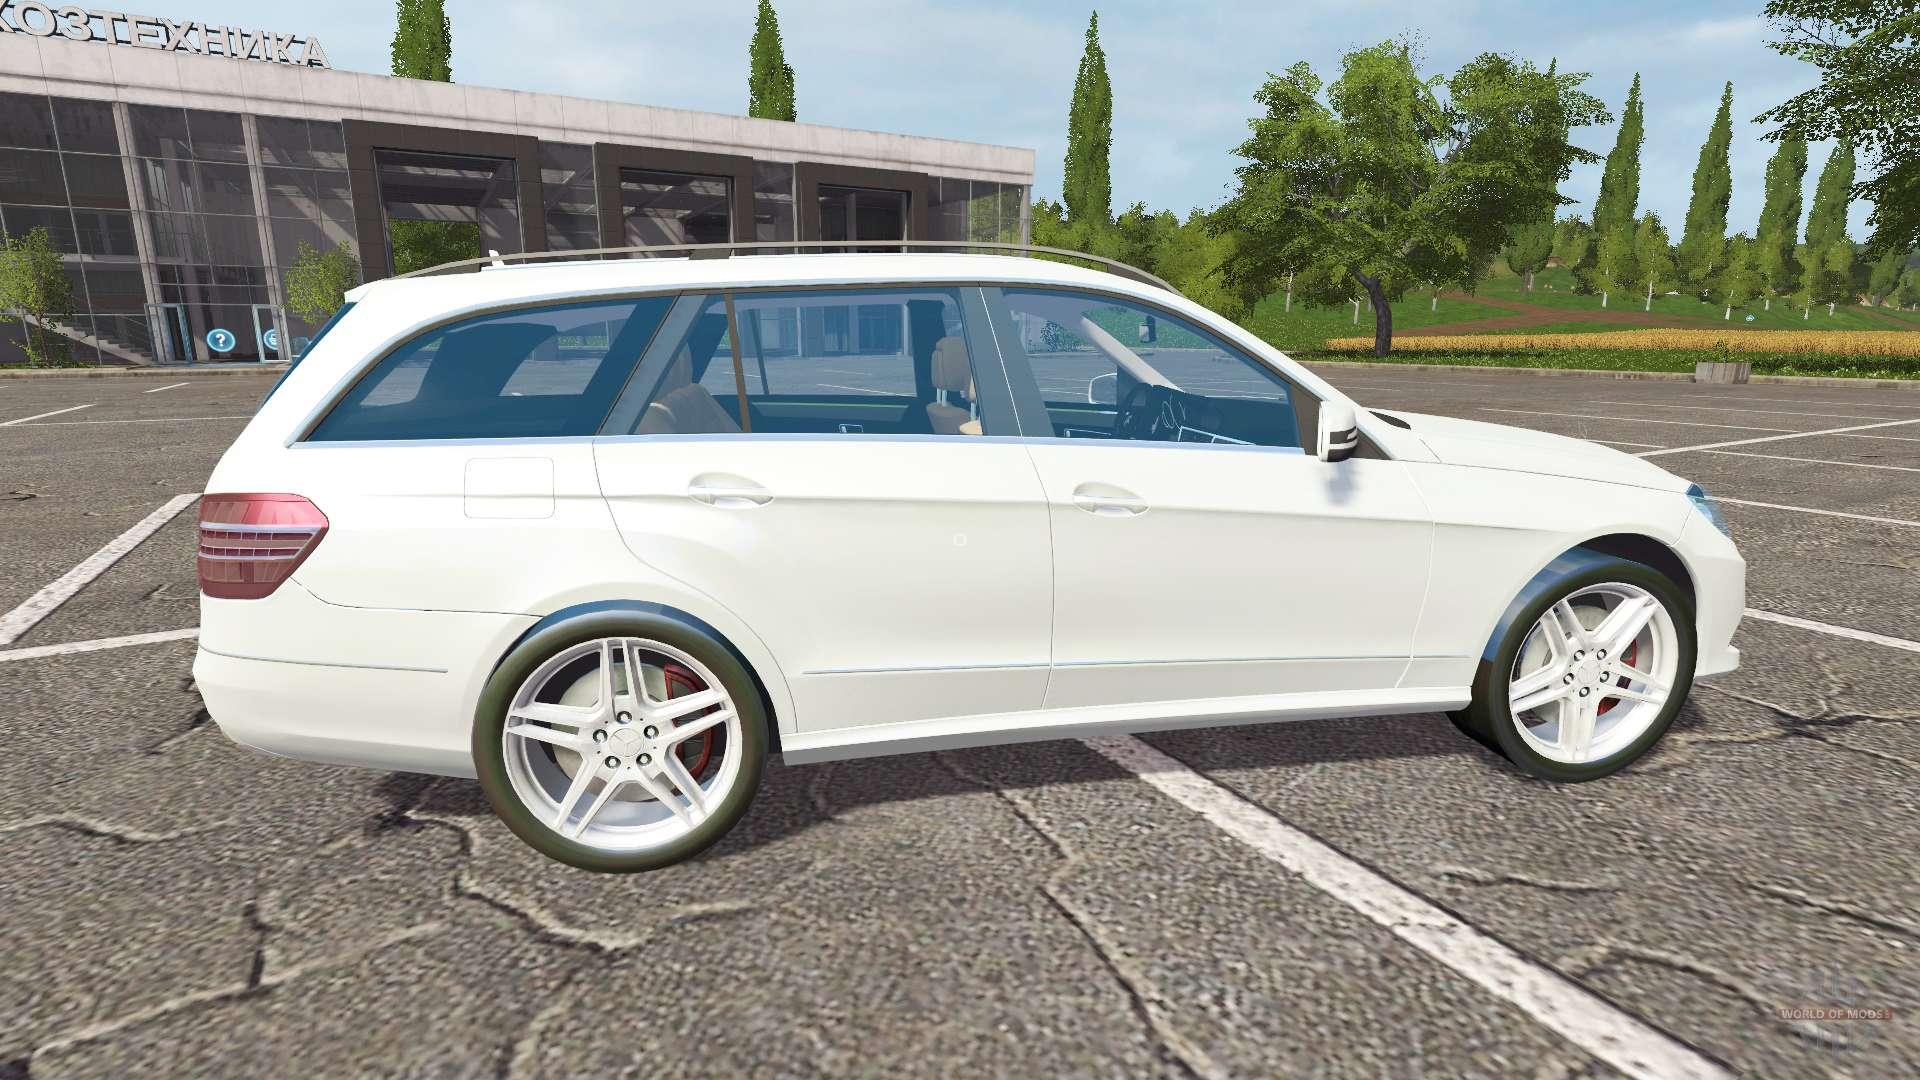 Mercedes benz e350 estate s212 for farming simulator 2017 for Mercedes benz games